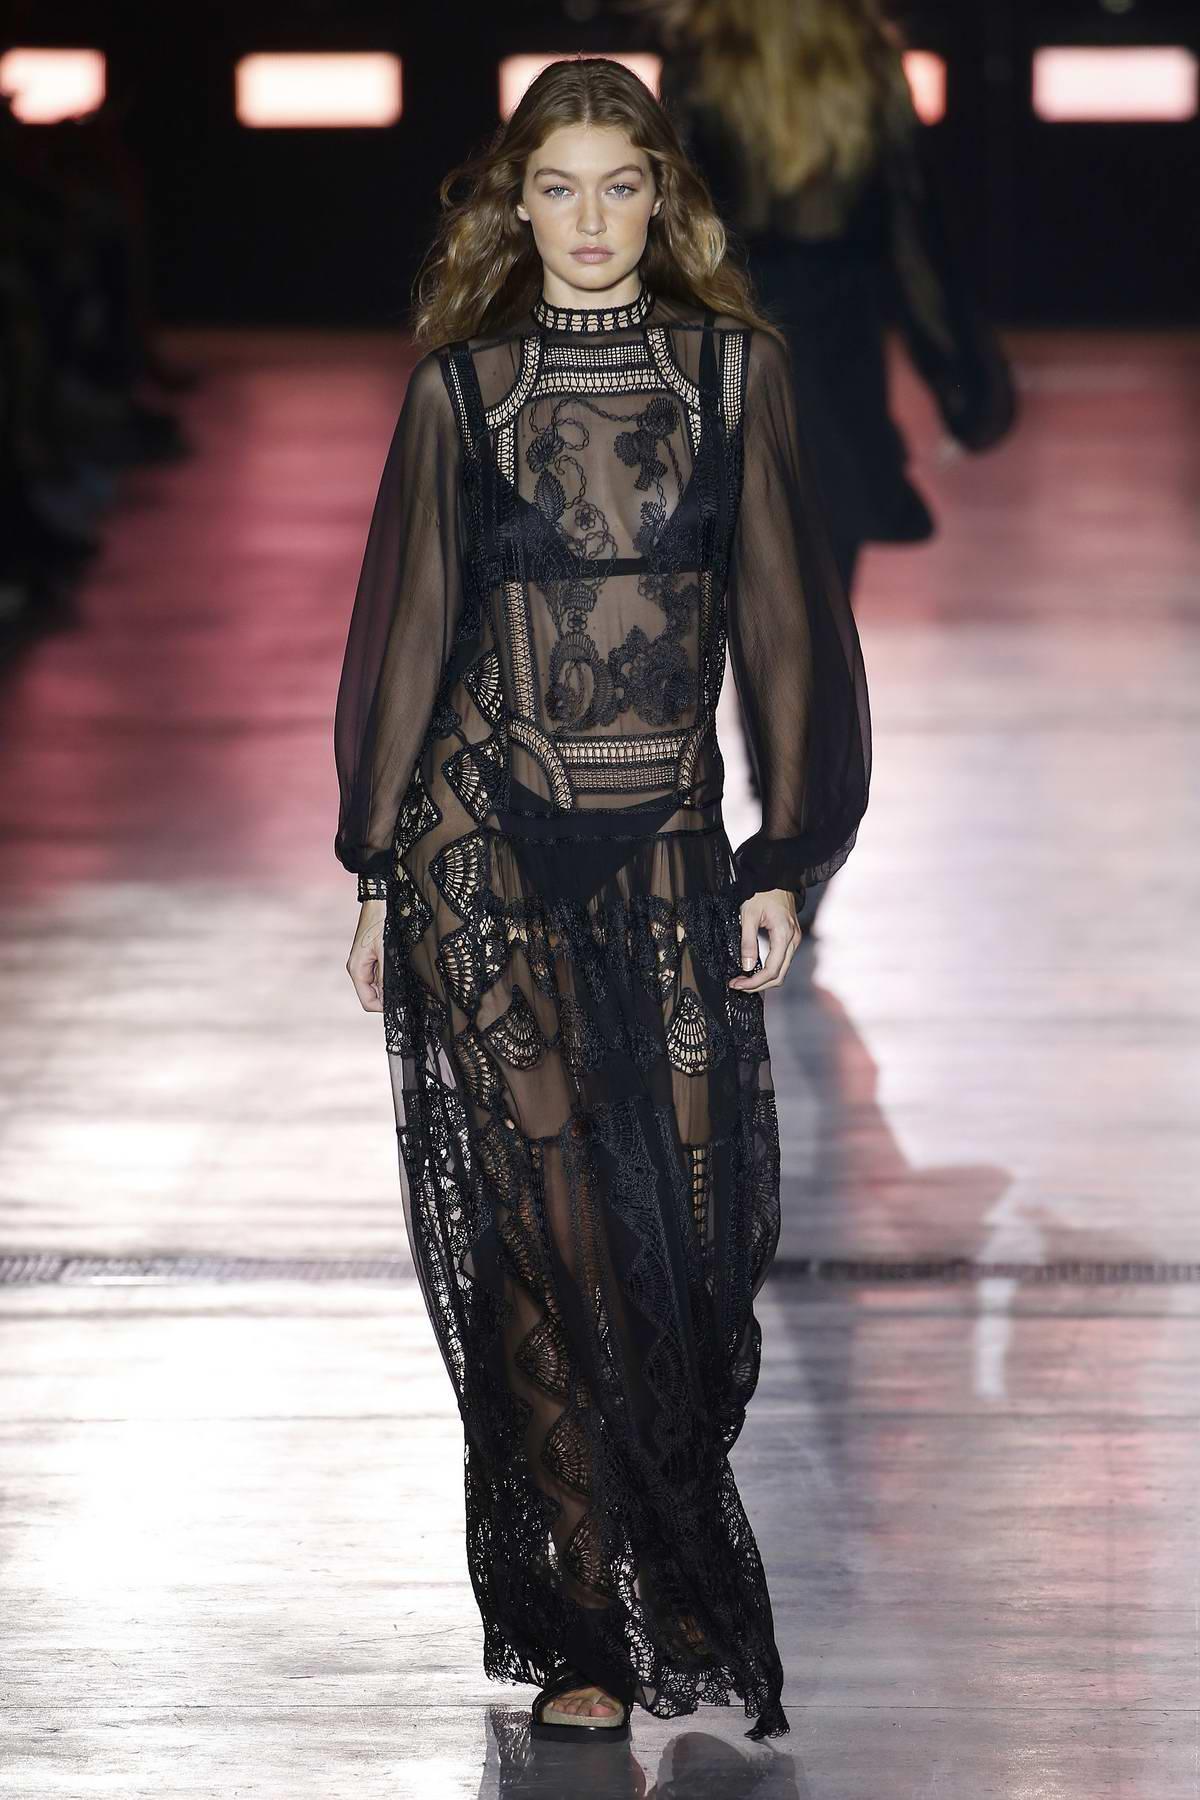 87daa8a4f27 Gigi Hadid walks the runway for Alberta Ferretti Show